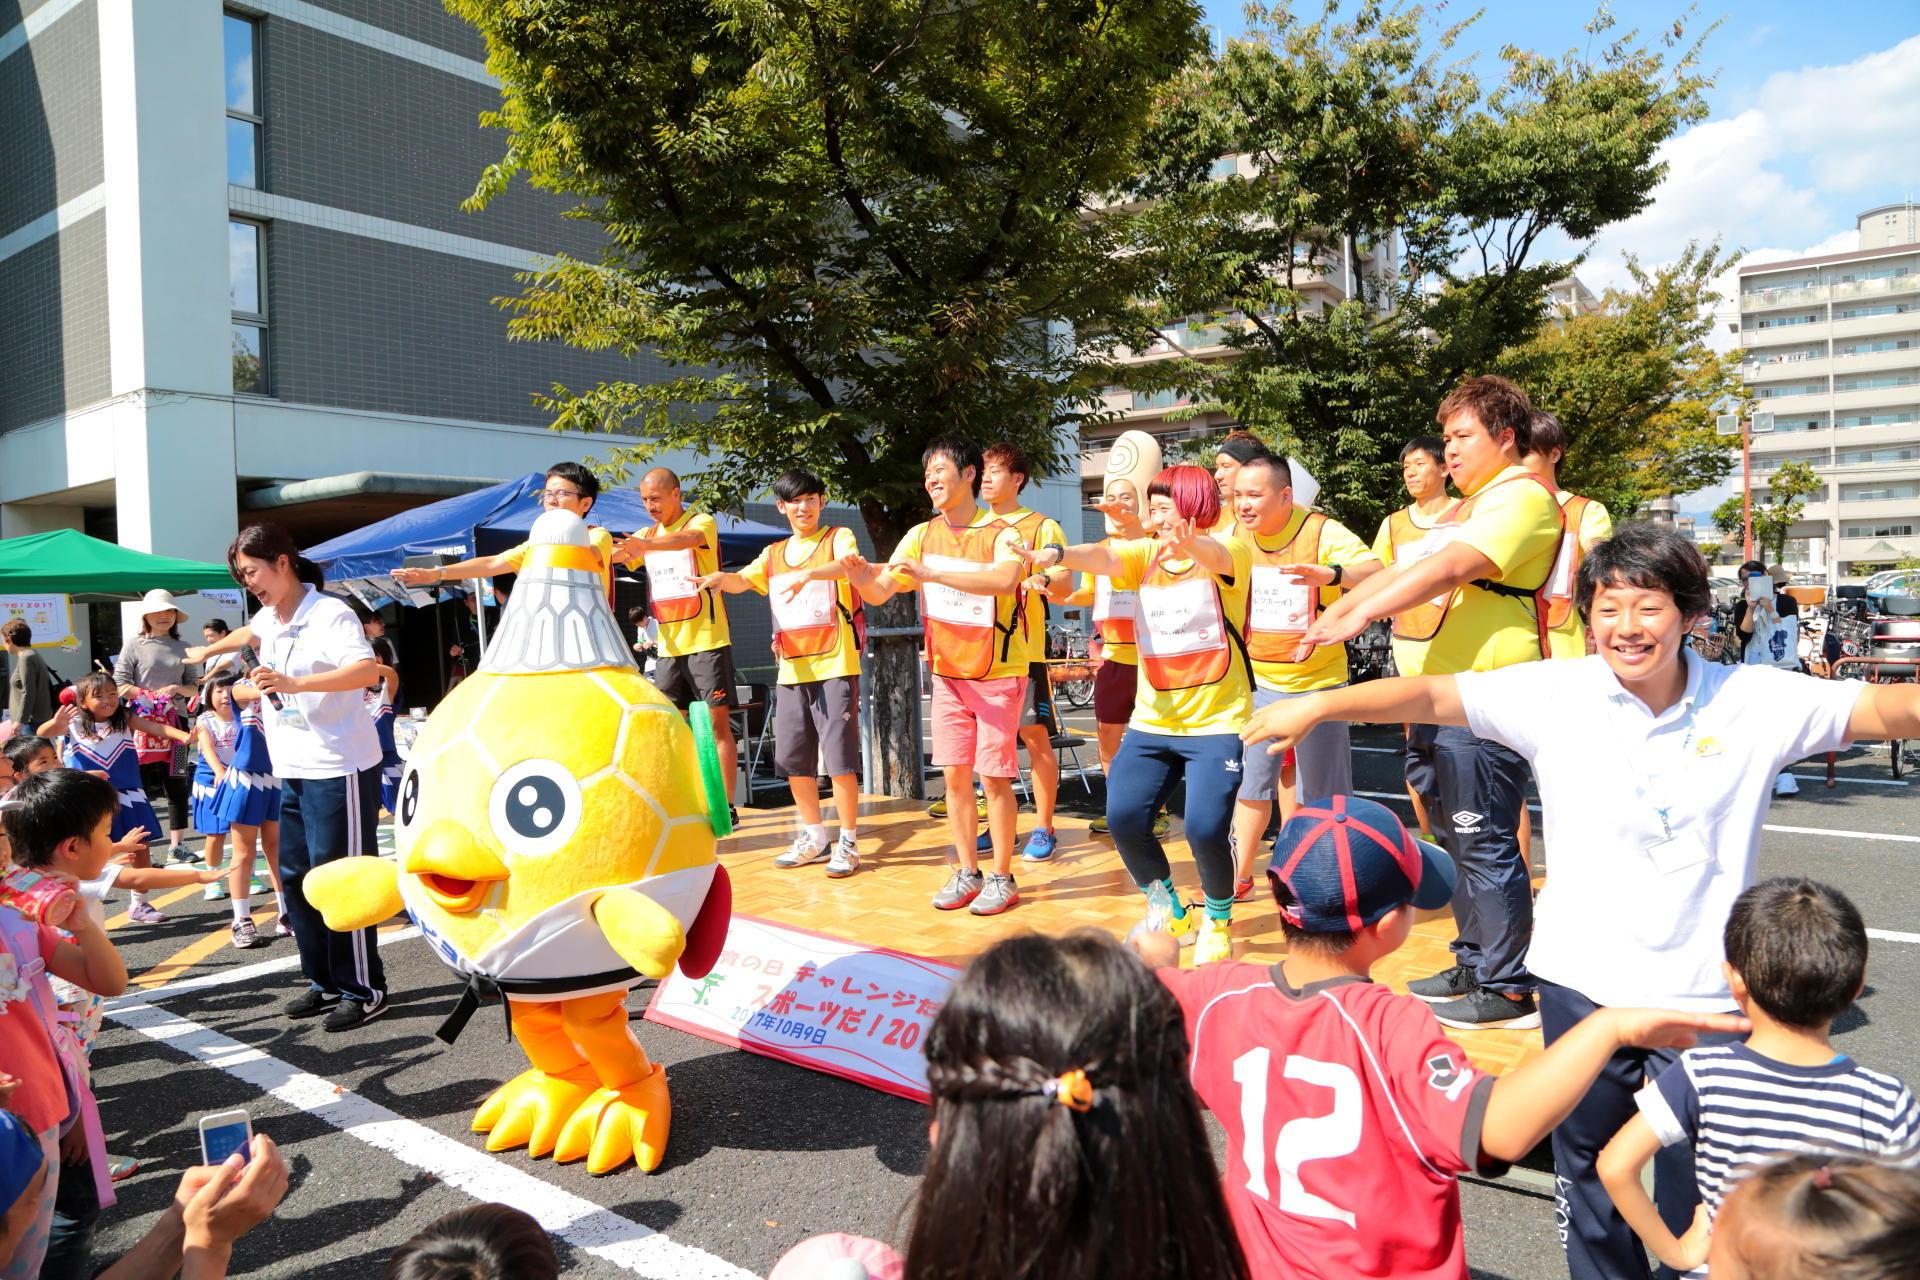 http://news.yoshimoto.co.jp/20171012102249-6c0576713a769655ba39e0e1dff7f990874516d7.jpg